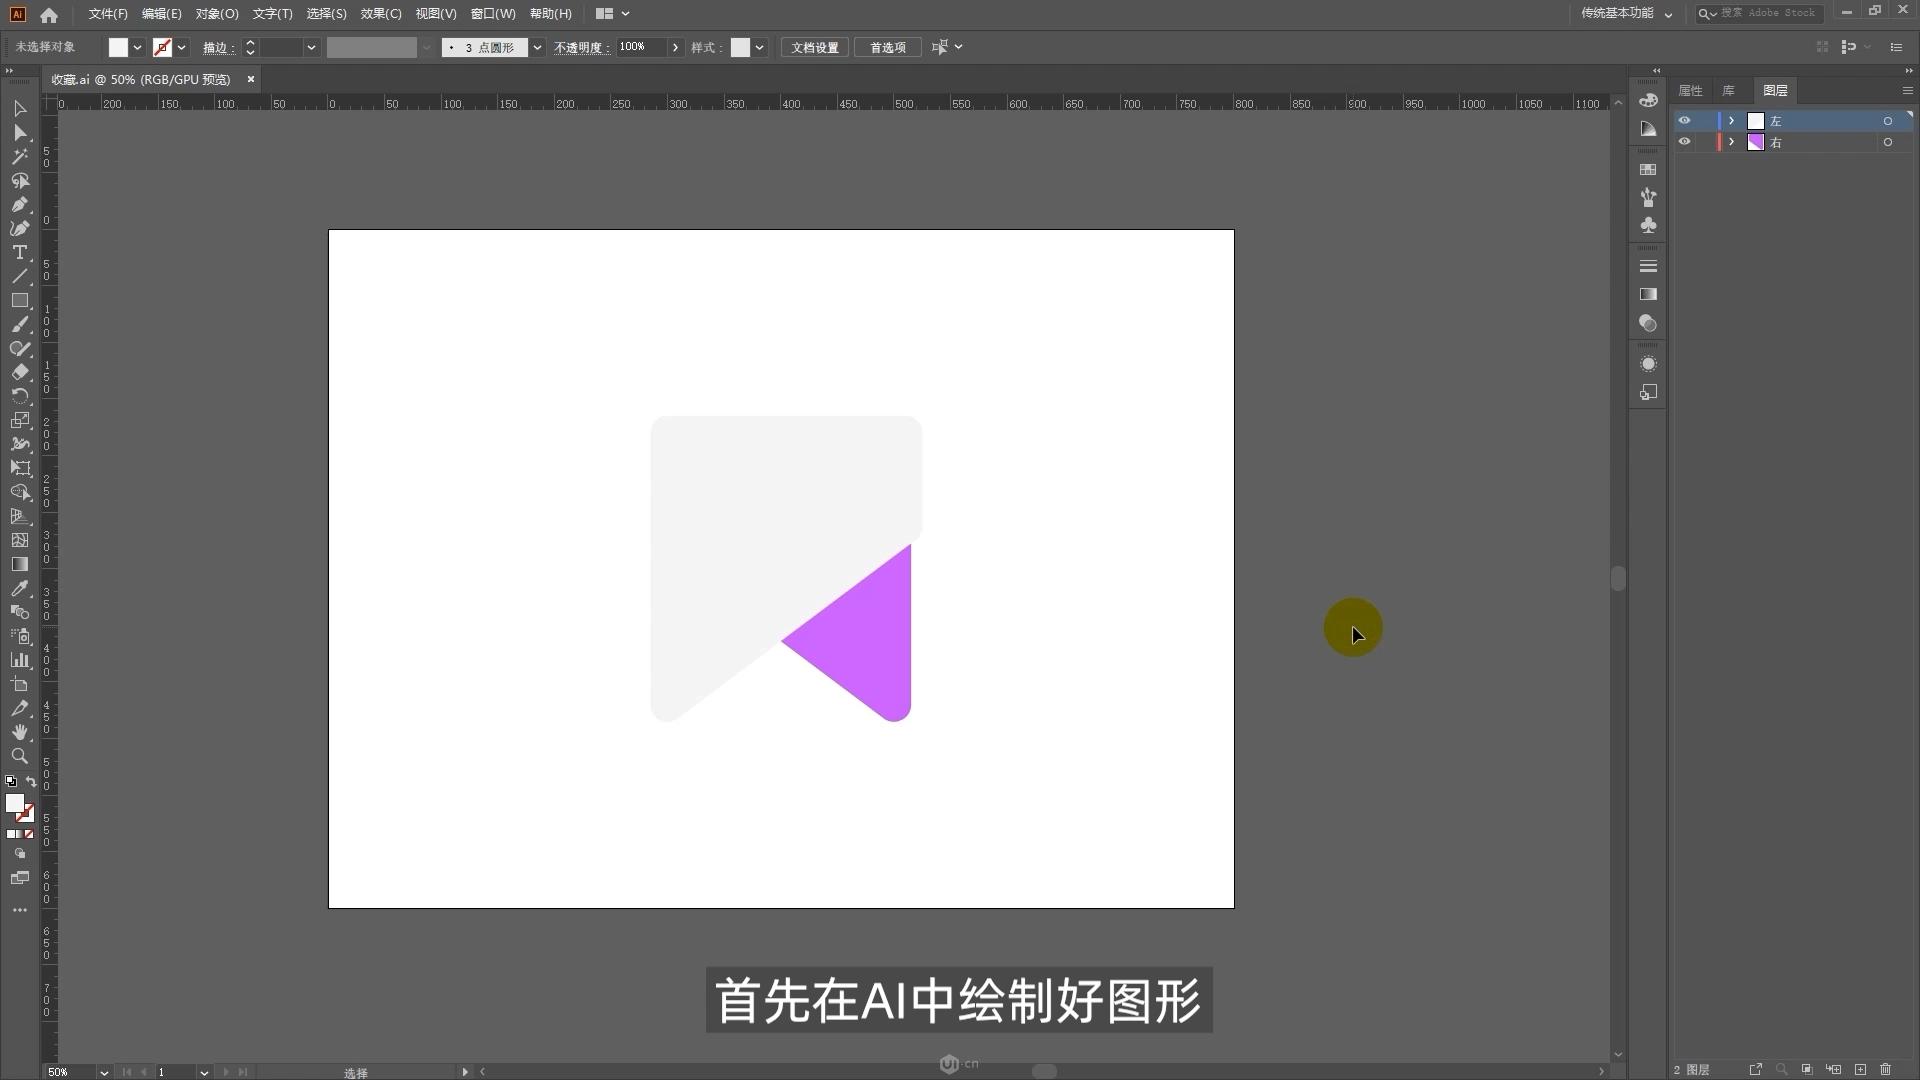 AE制作毛玻璃风格图标动效(1)